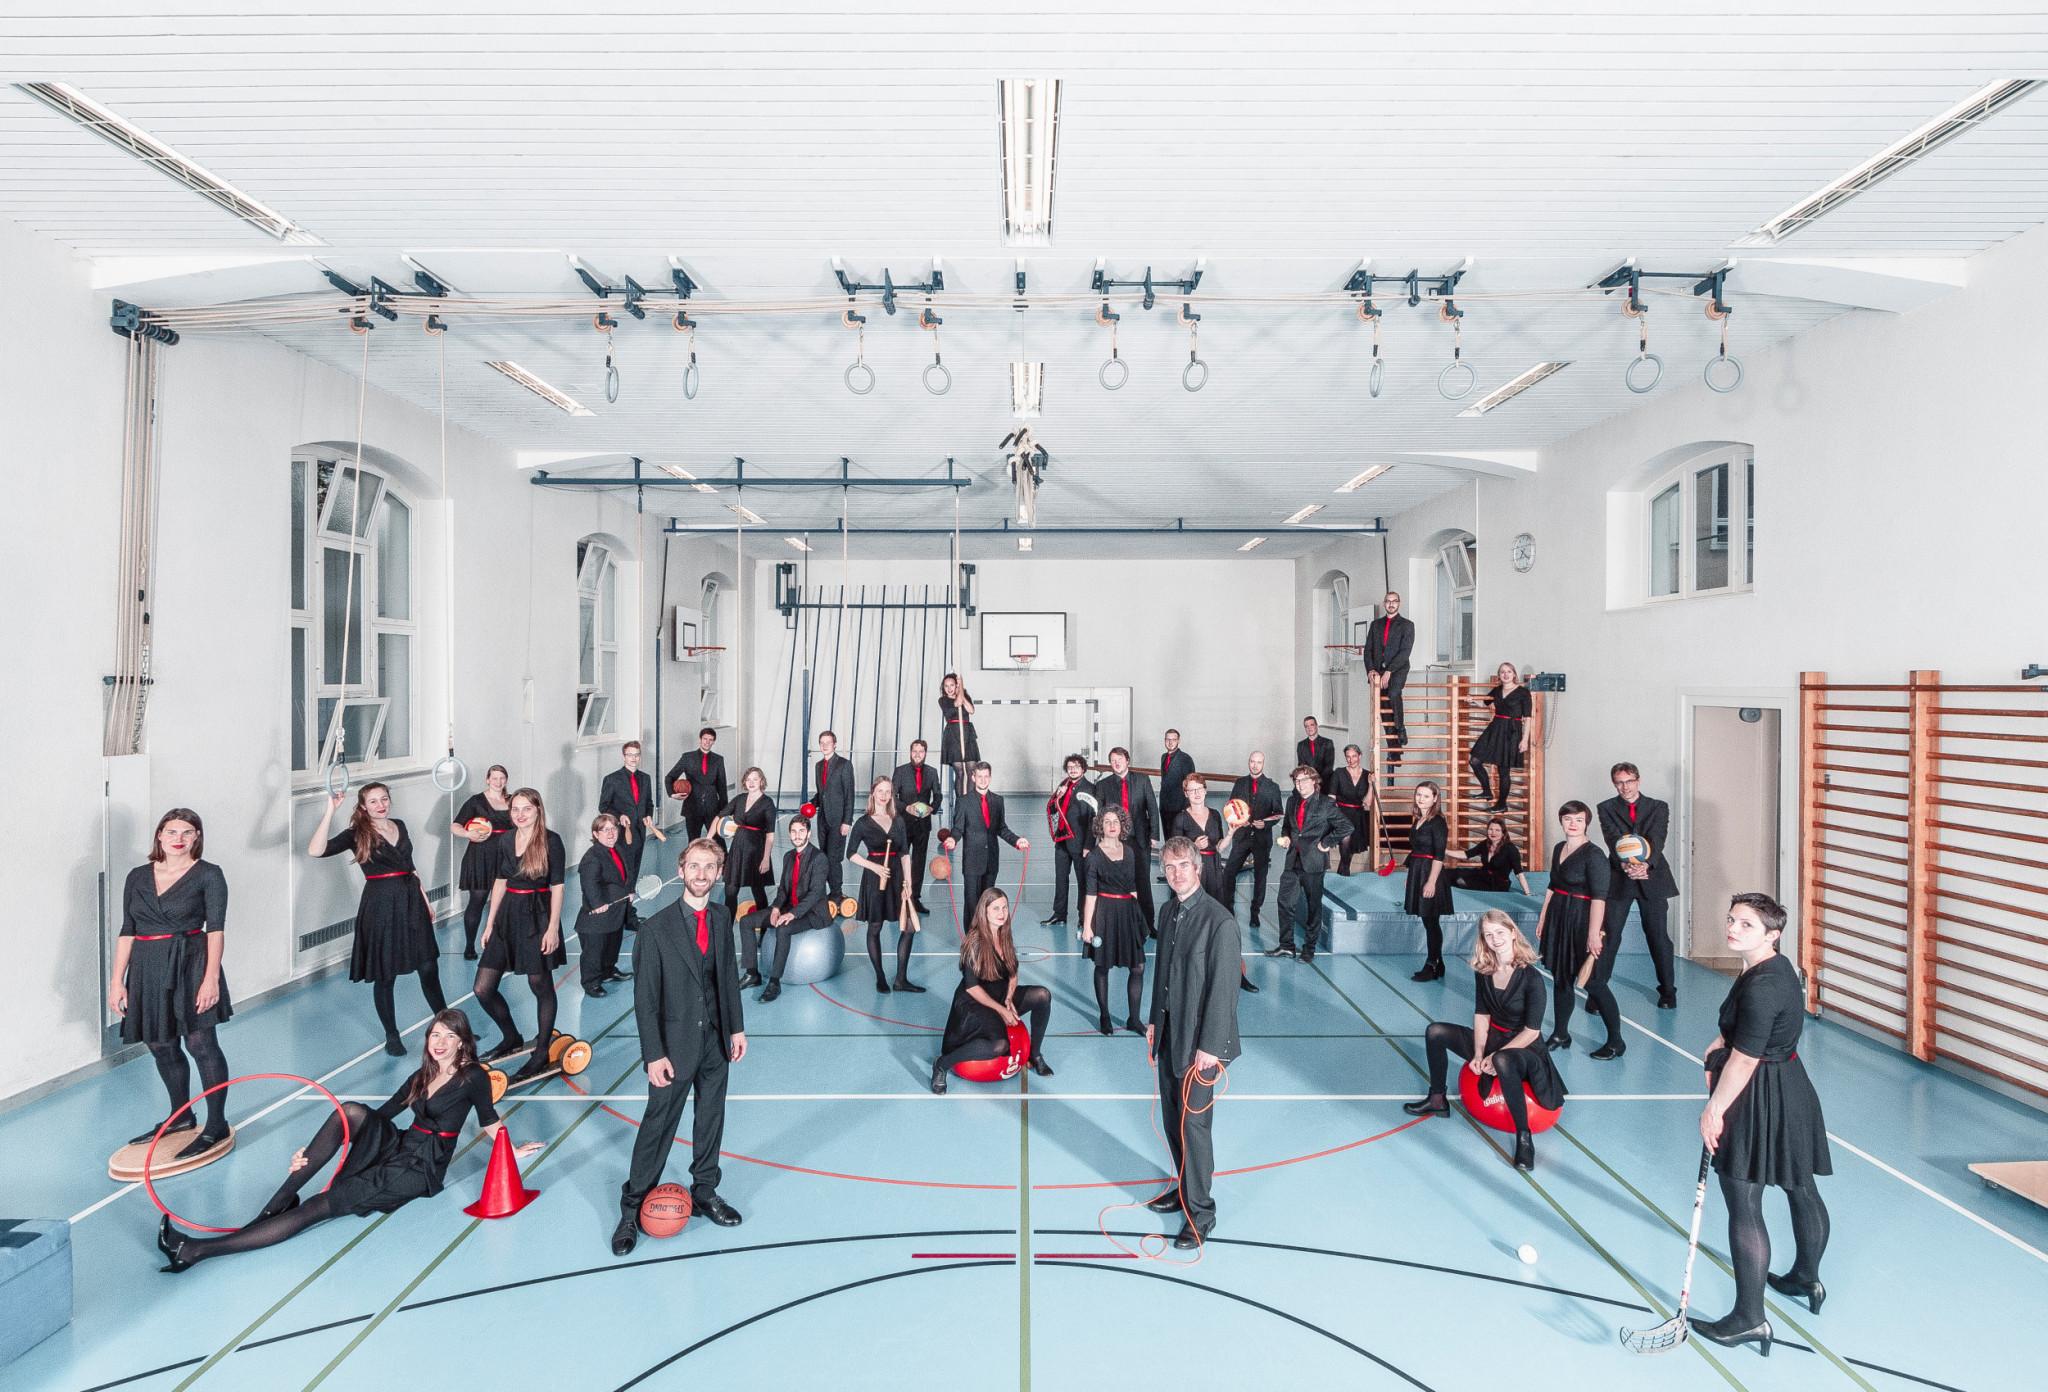 Pressebild 2018, Foto: Markus Räber